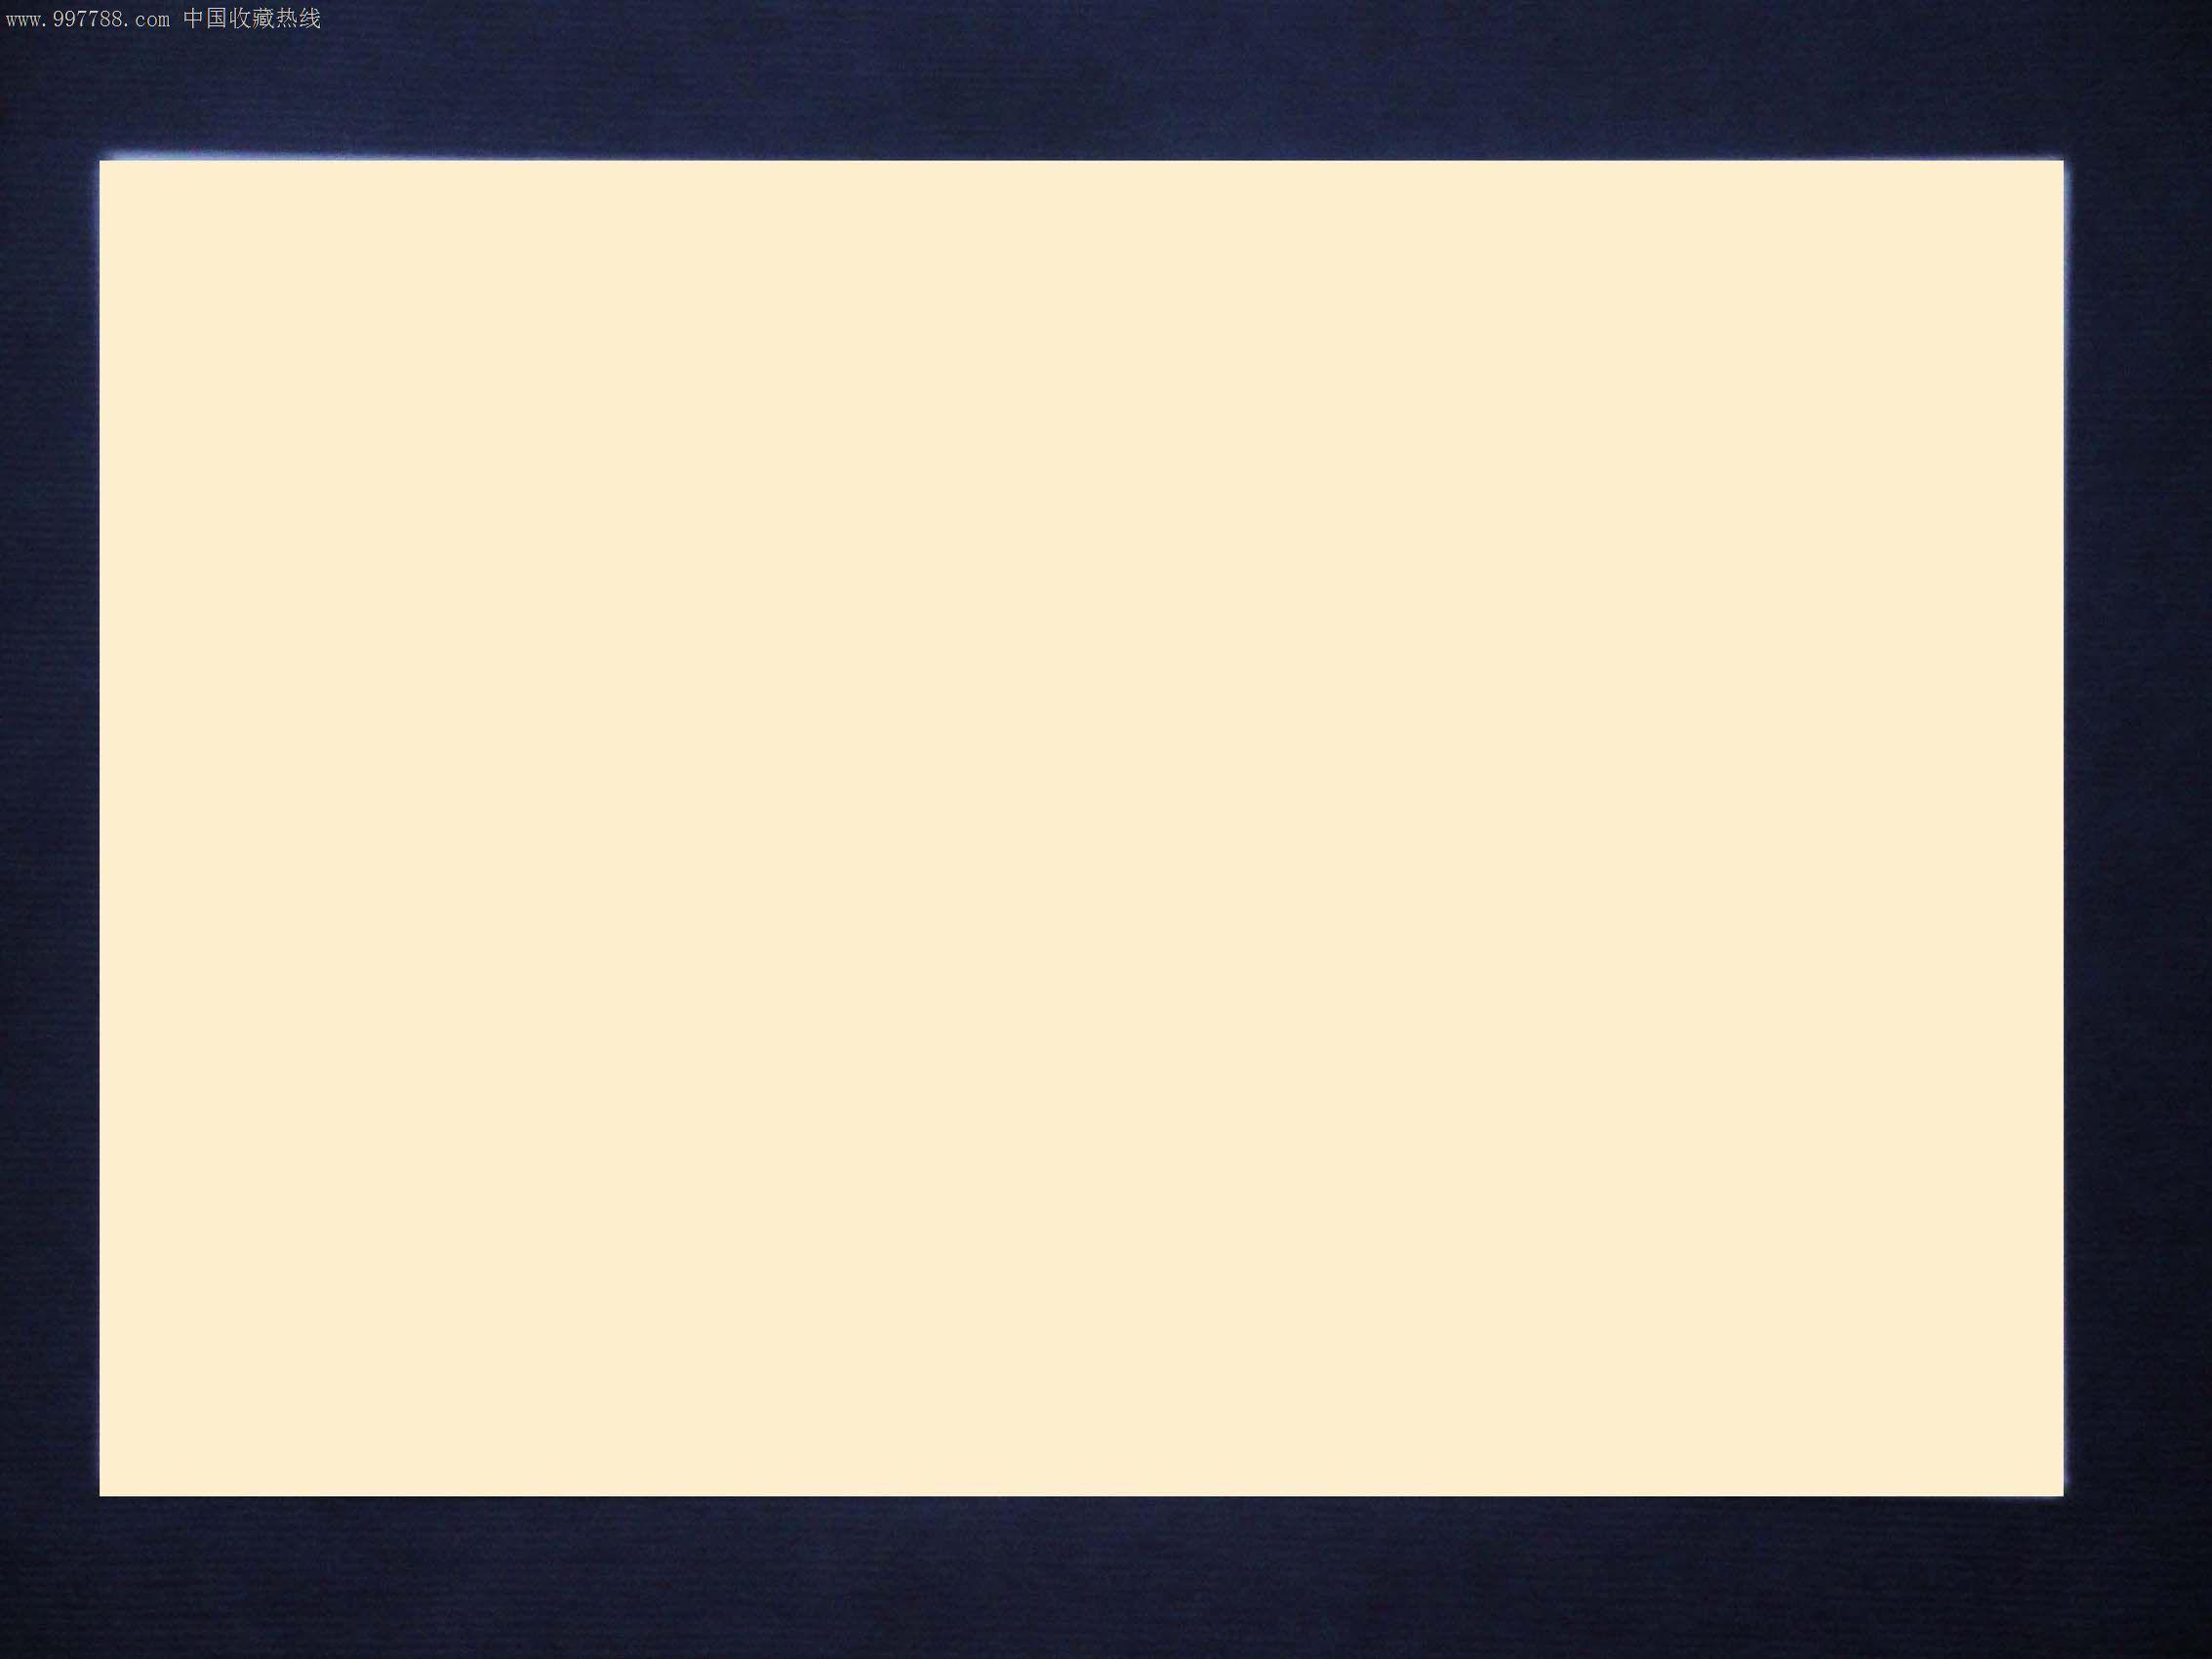 ppt 背景 背景图片 边框 模板 设计 矢量 矢量图 素材 相框 2267_1700